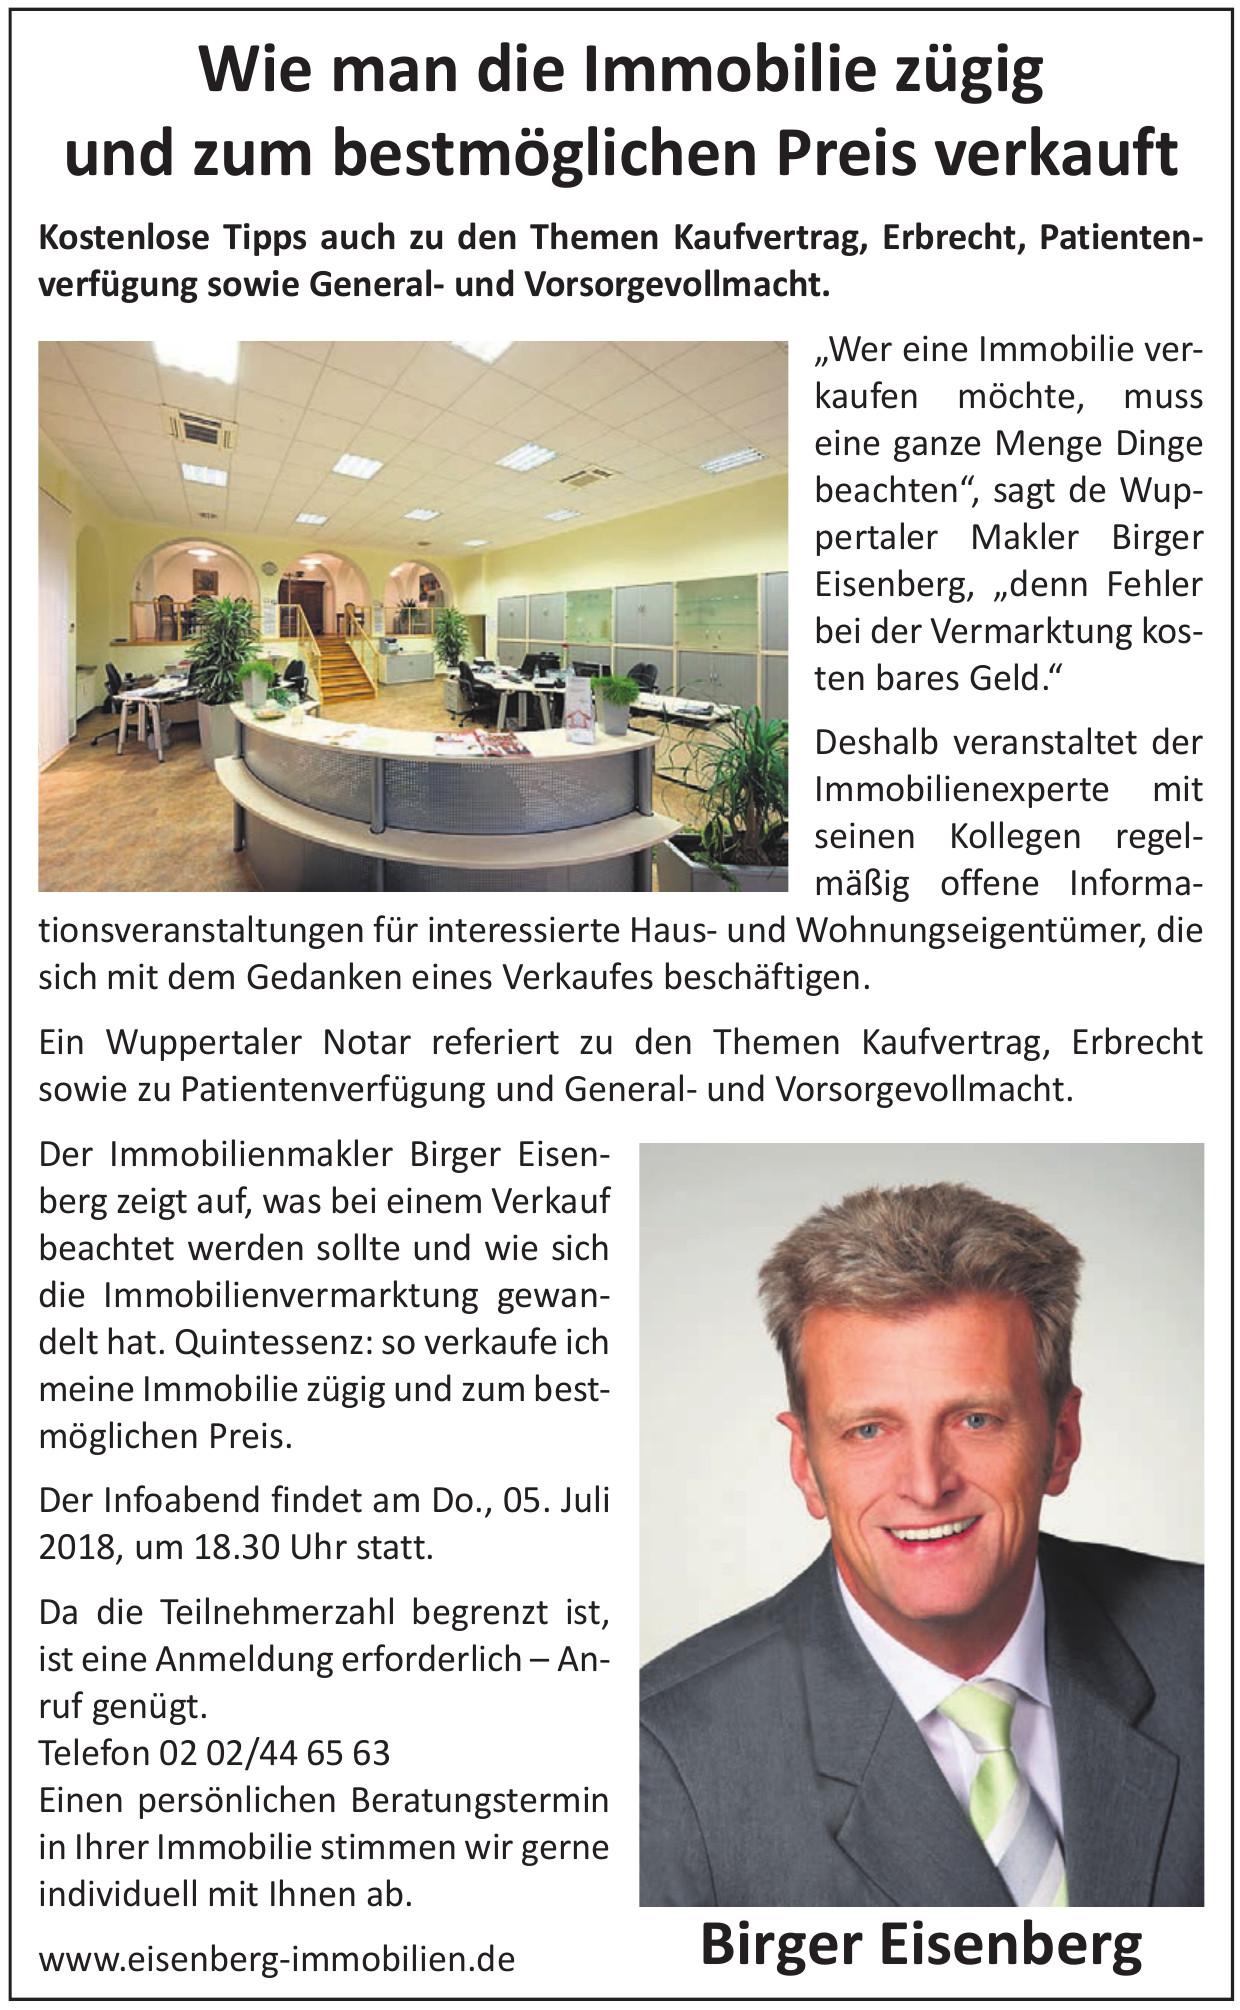 Birger Eisenberg Immobilien